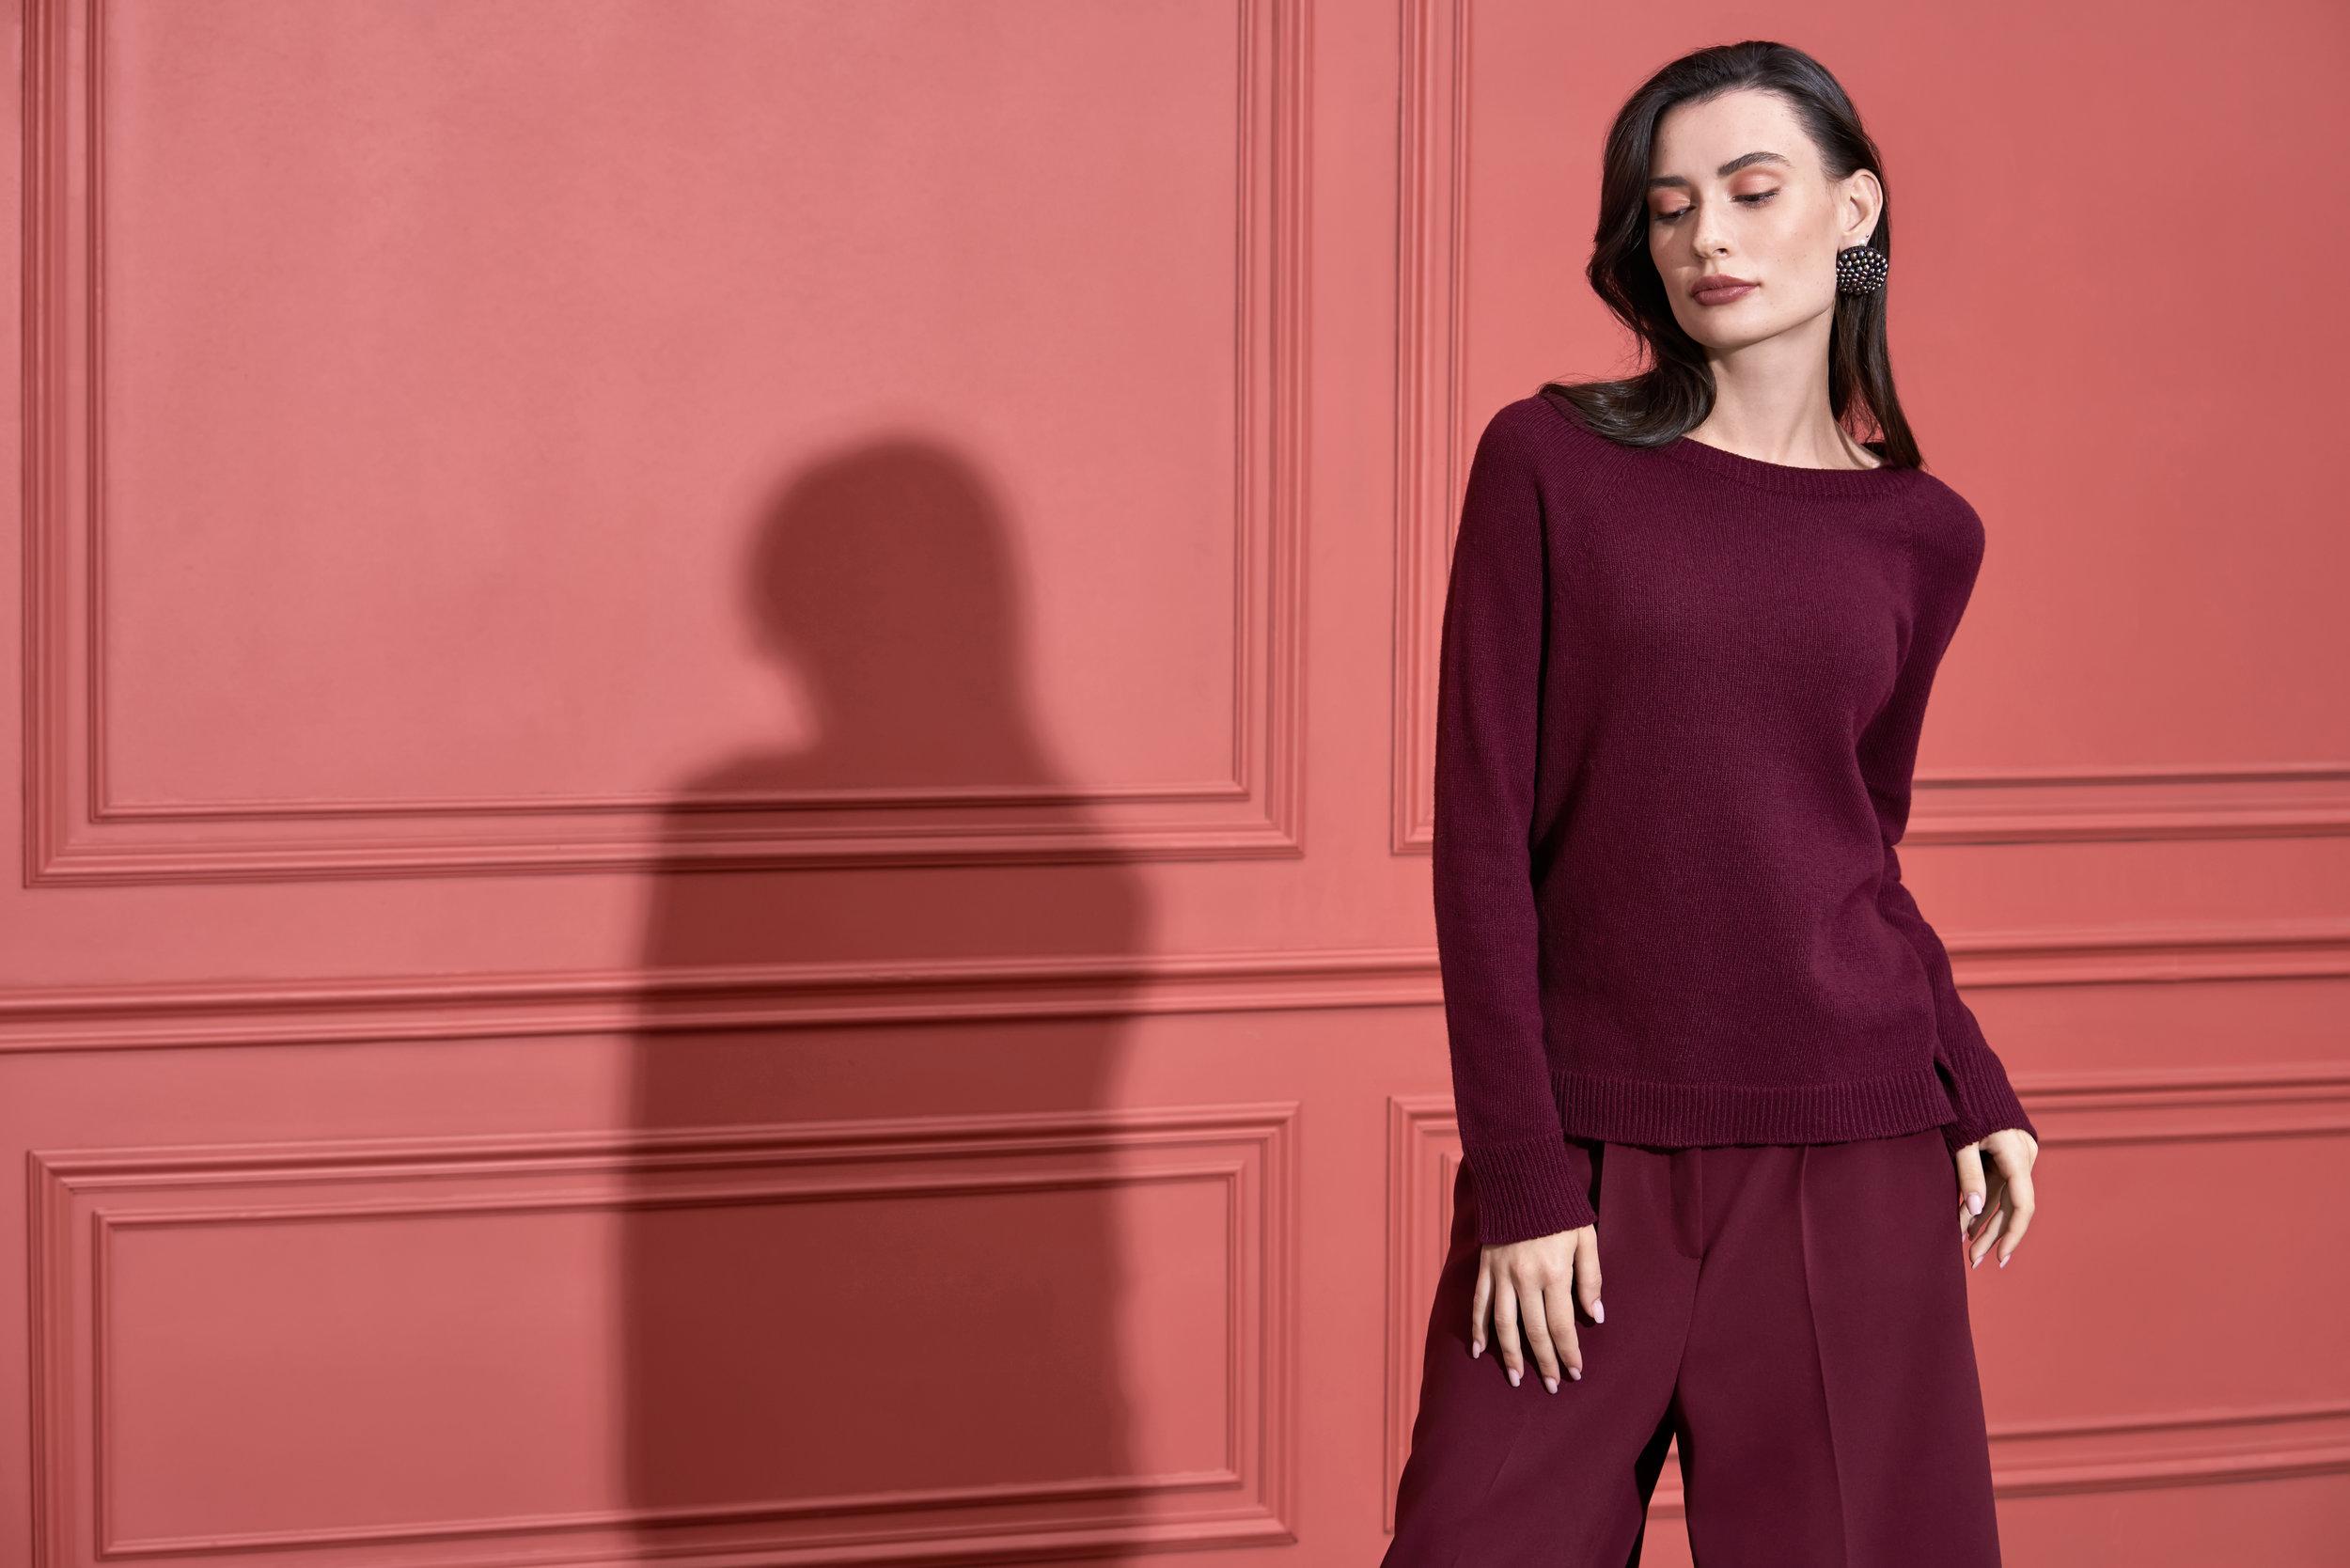 Model posing in studio in trendy clothes